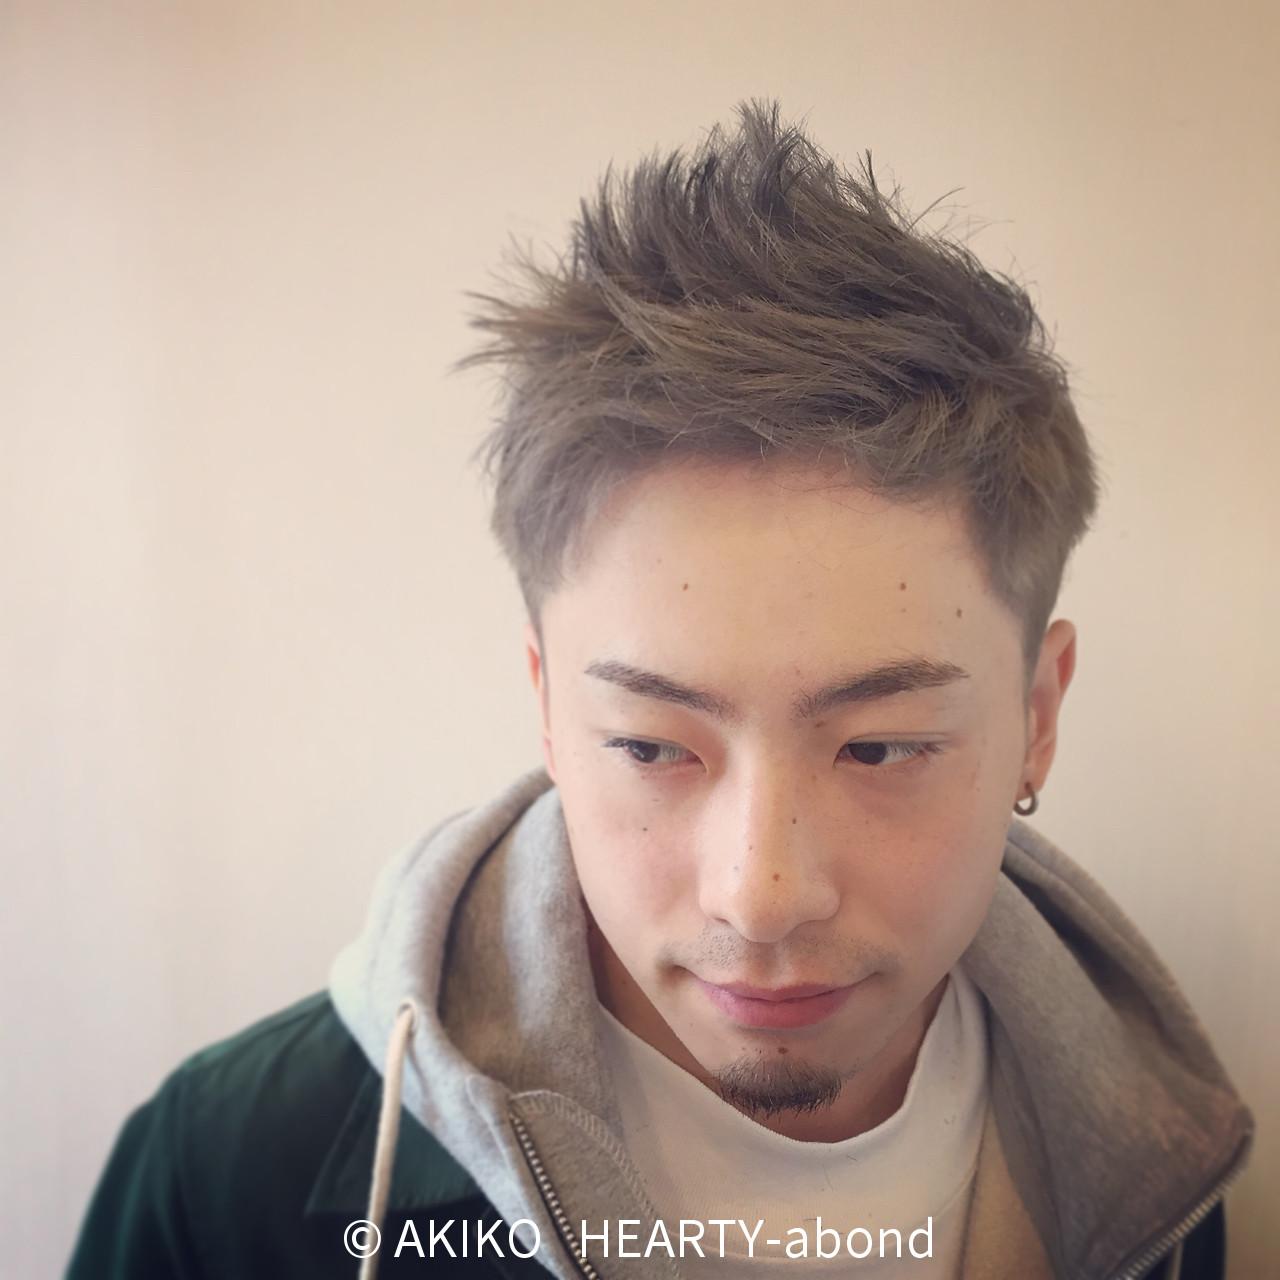 AKIKO HEARTY-abond